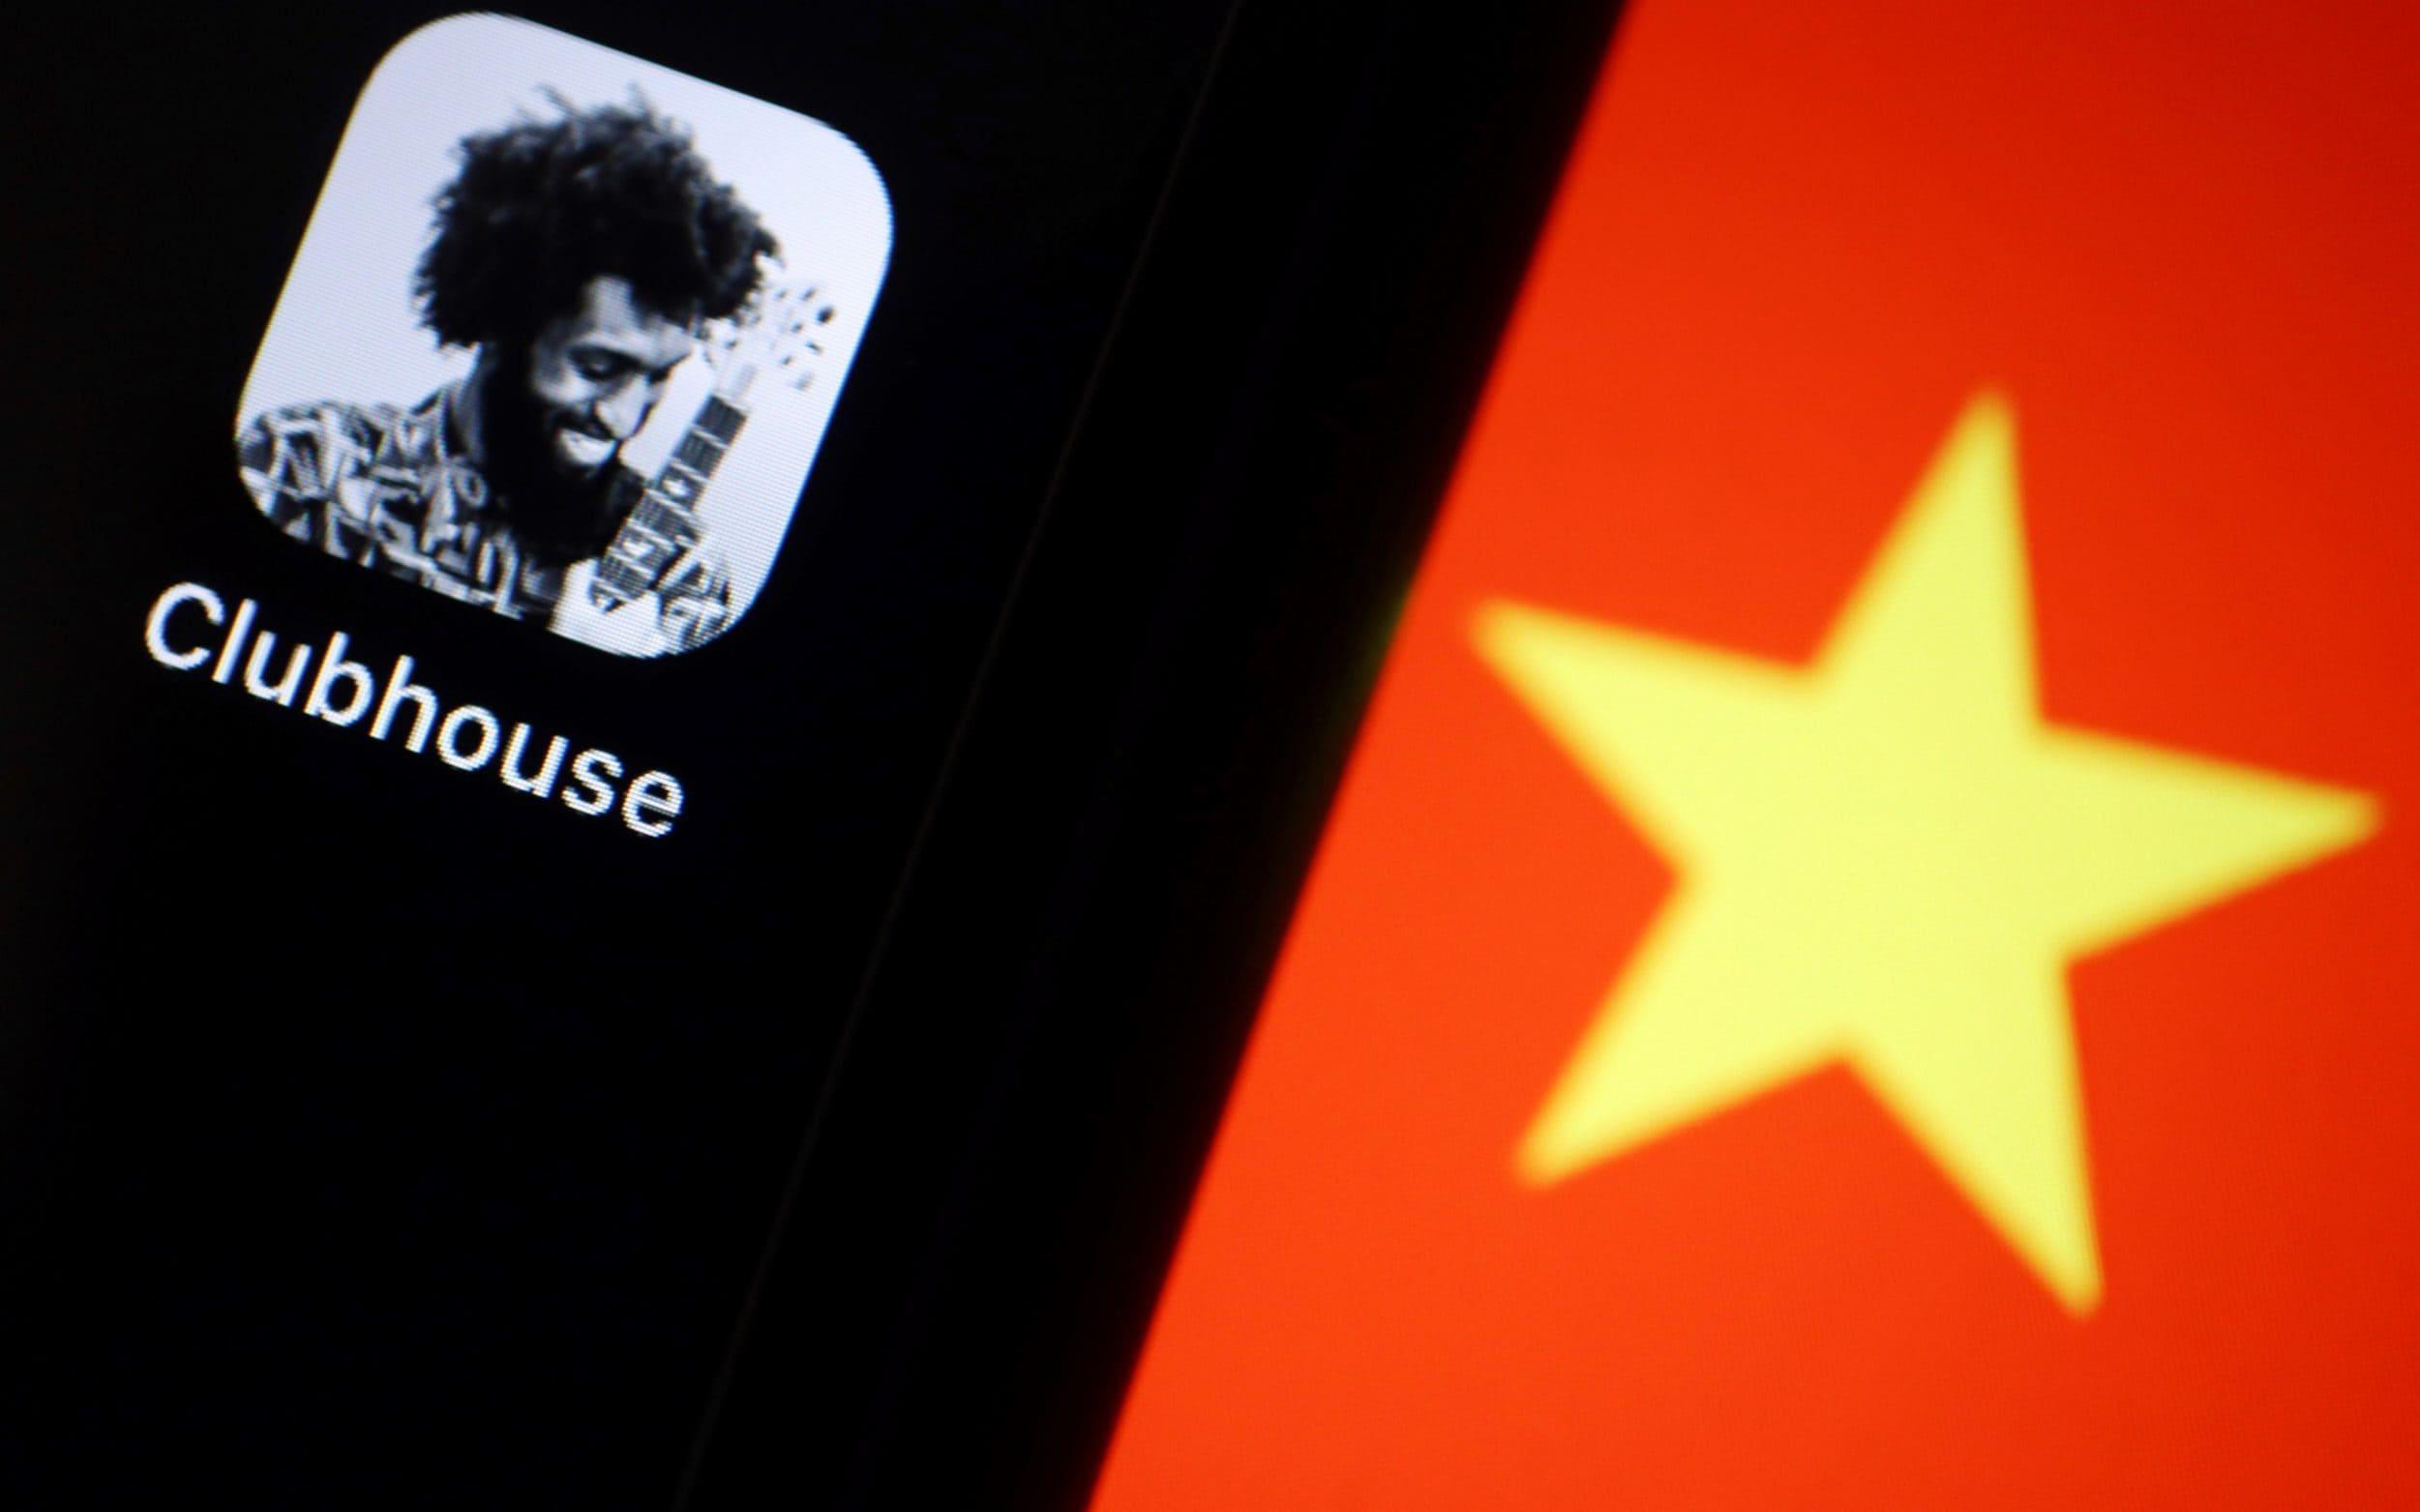 Antes mesmo do lançamento oficial, o Clubhouse foi bloqueado na China.